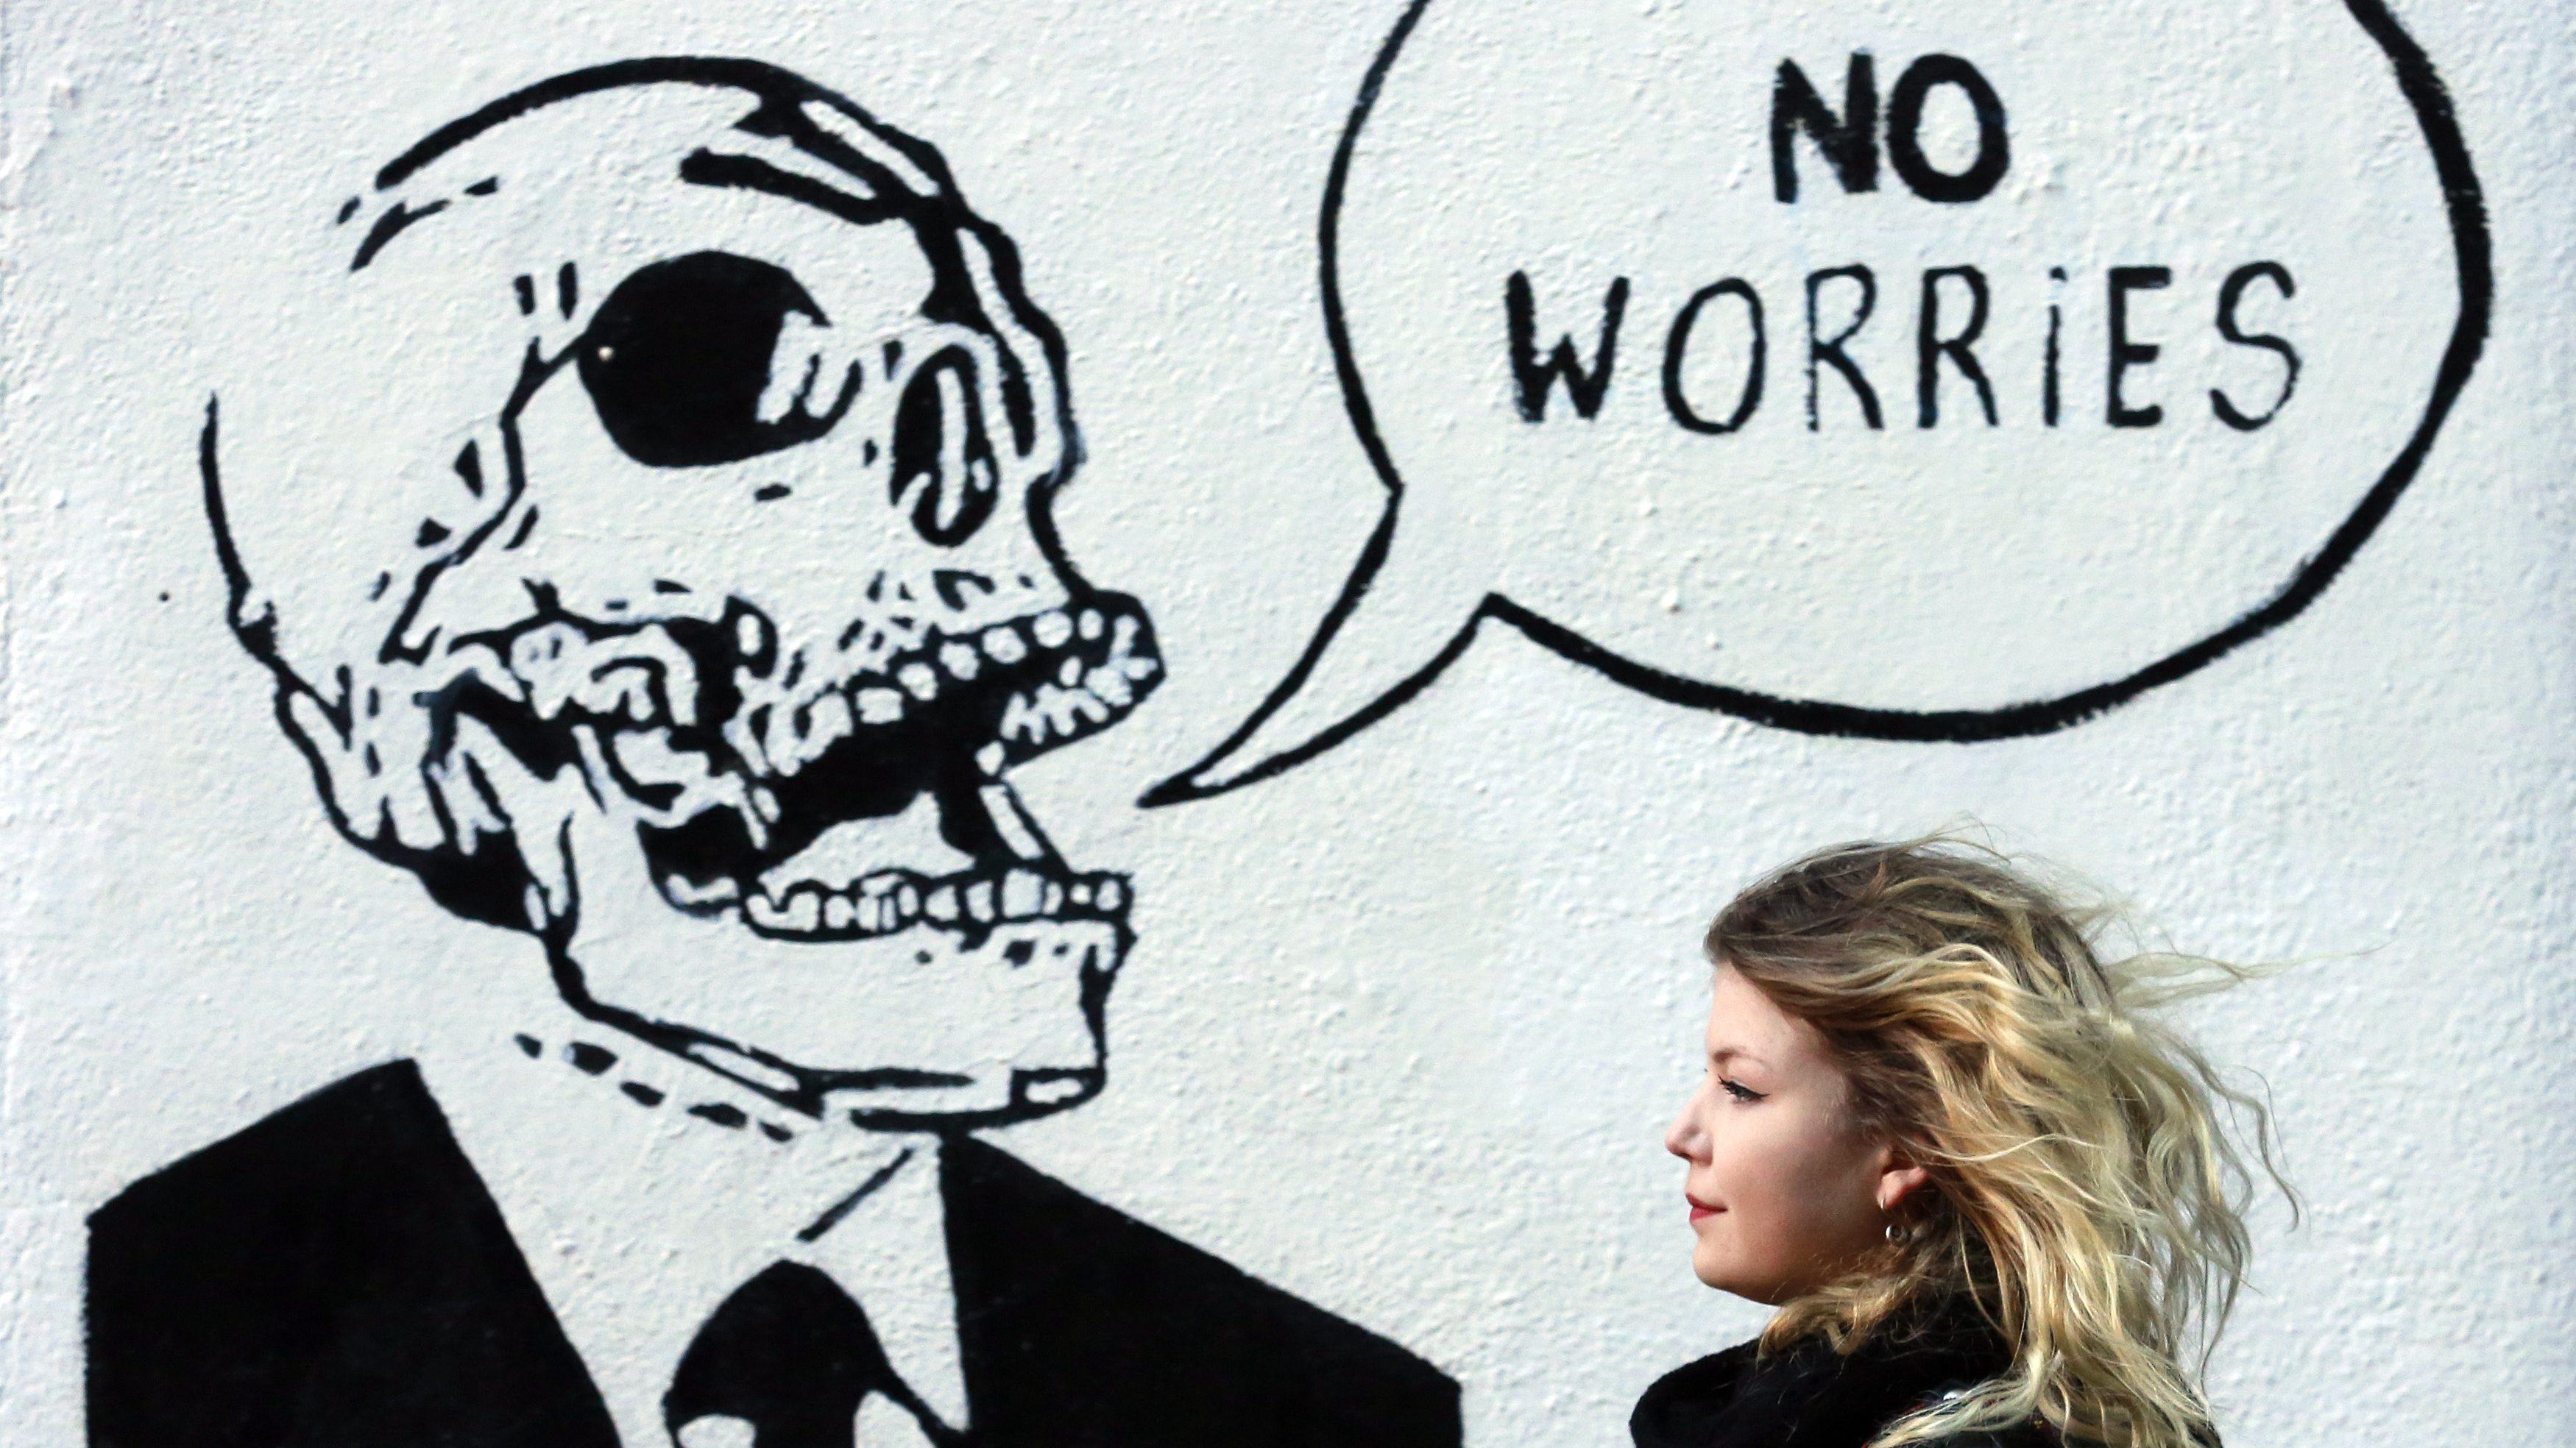 A woman walks past graffiti in the Temple Bar area of Dublin